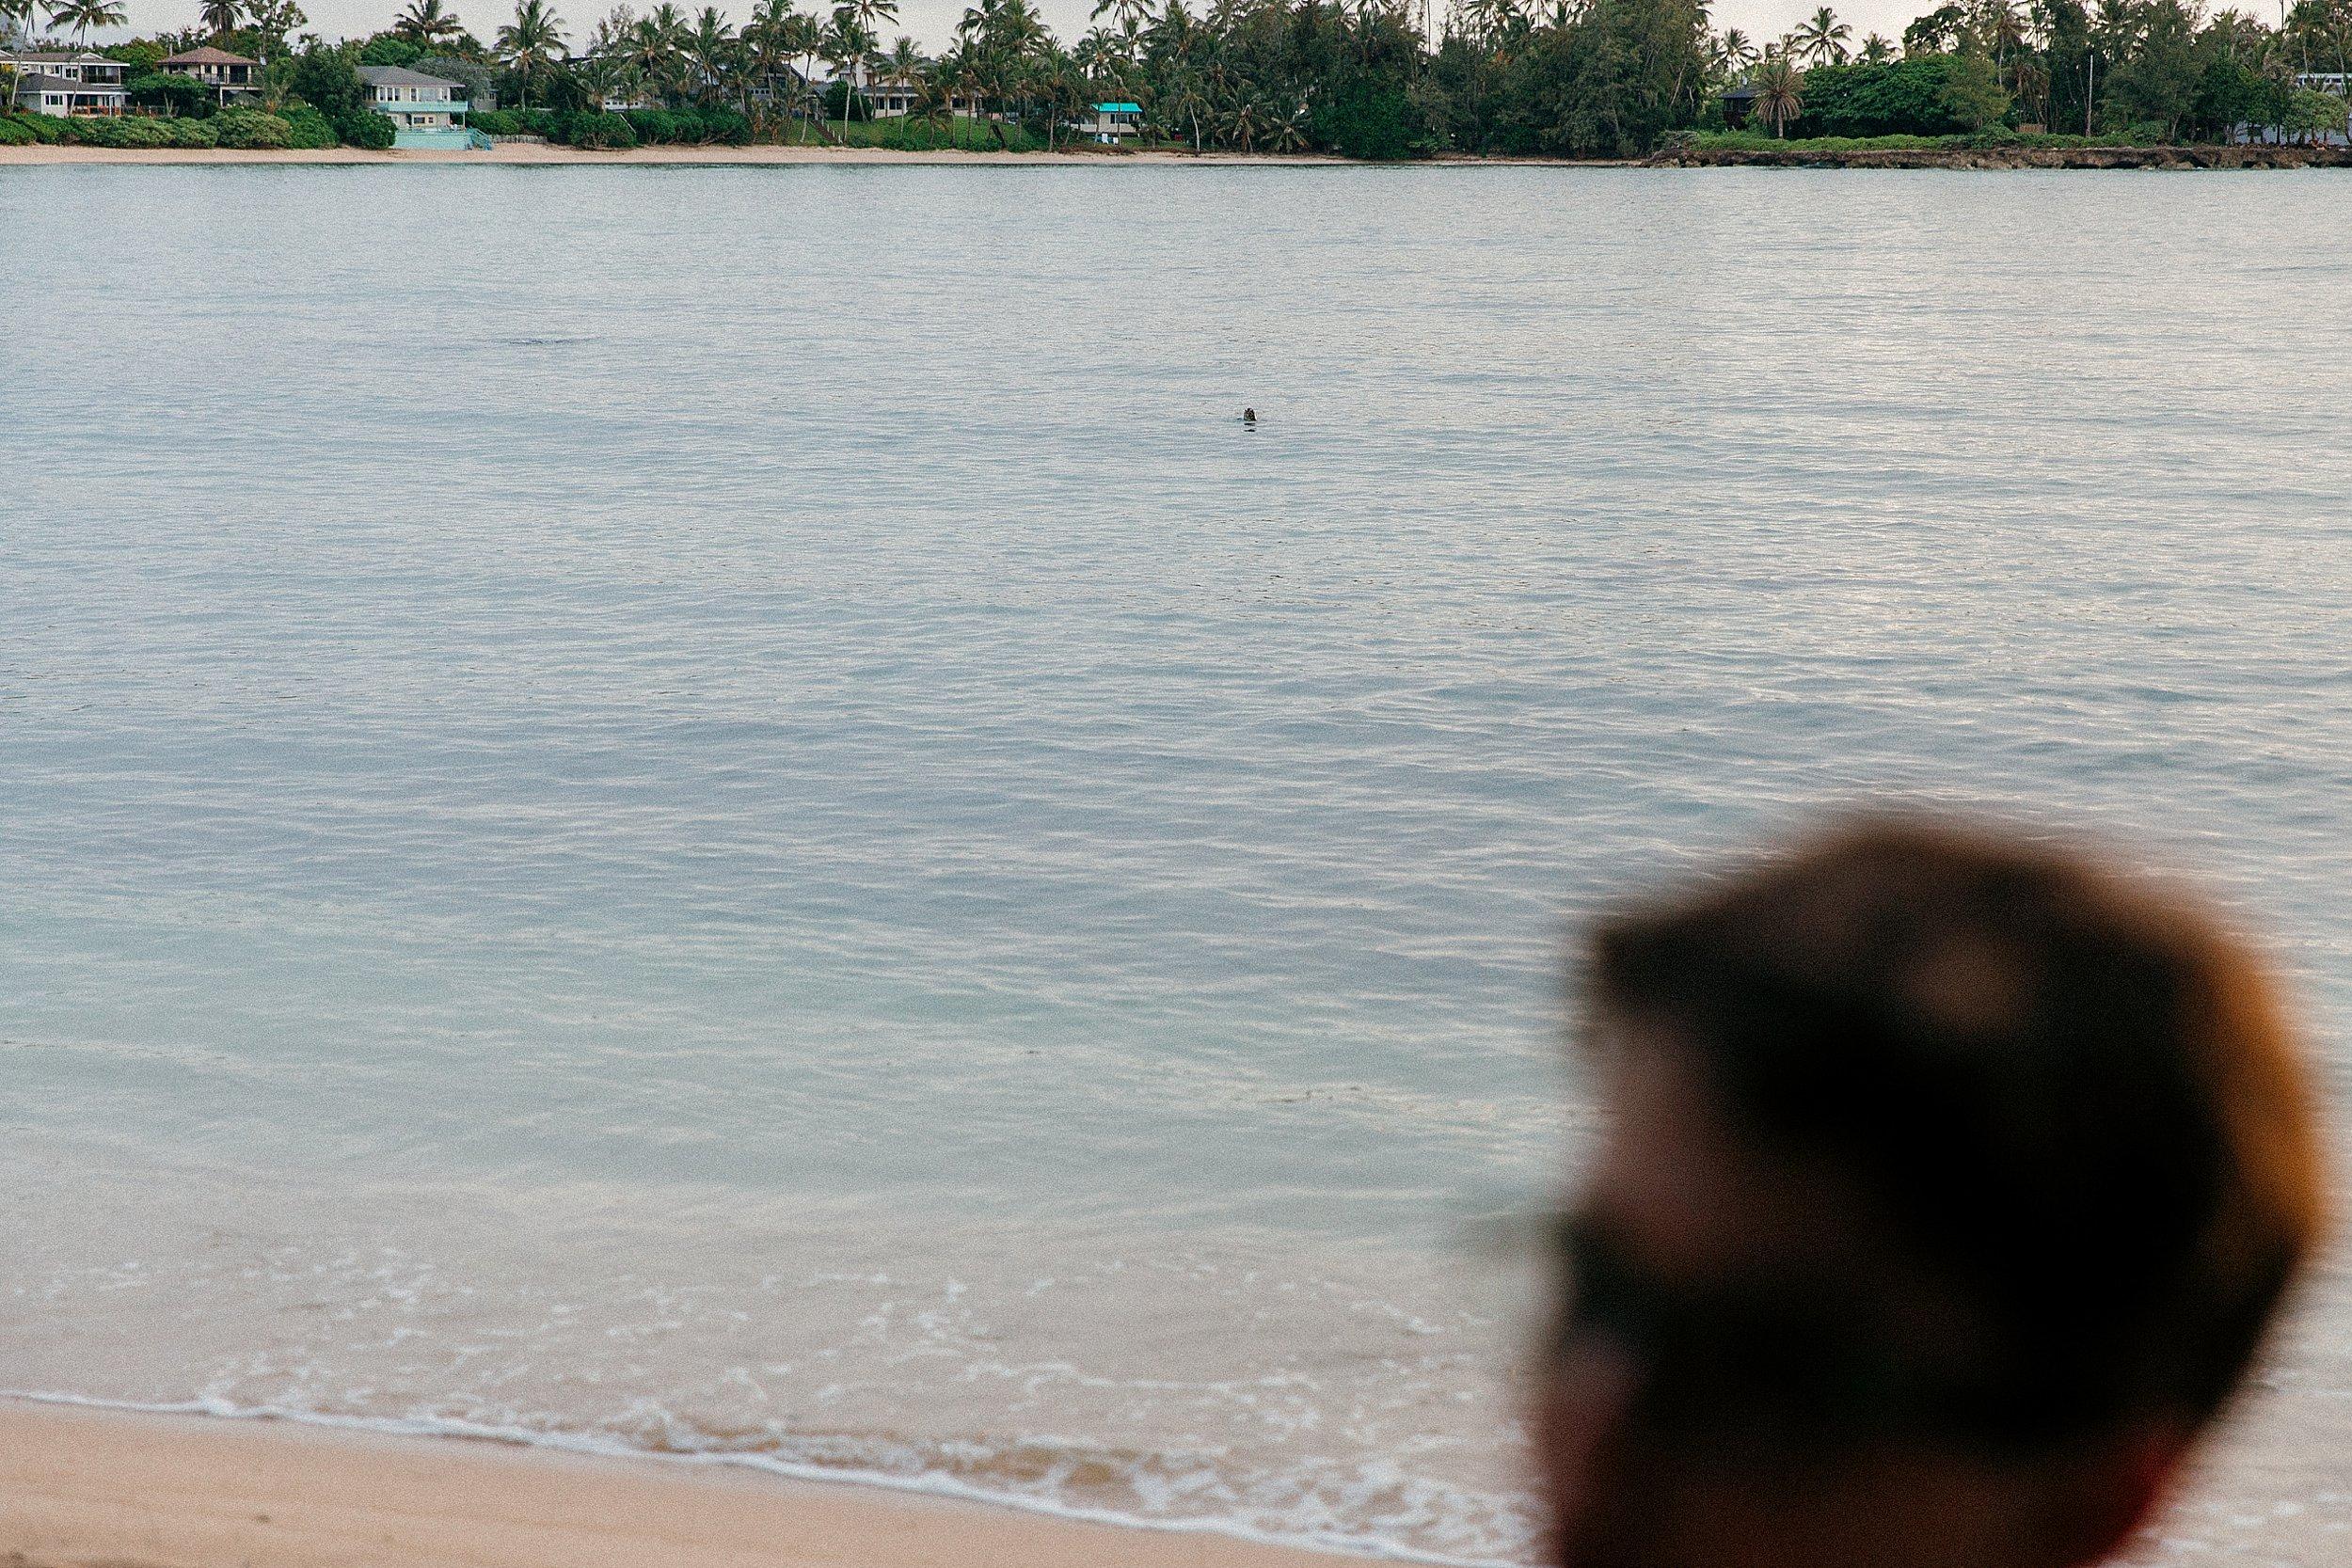 Family Session at Kawela Bay Banyan Tree near Turtle Bay Resort